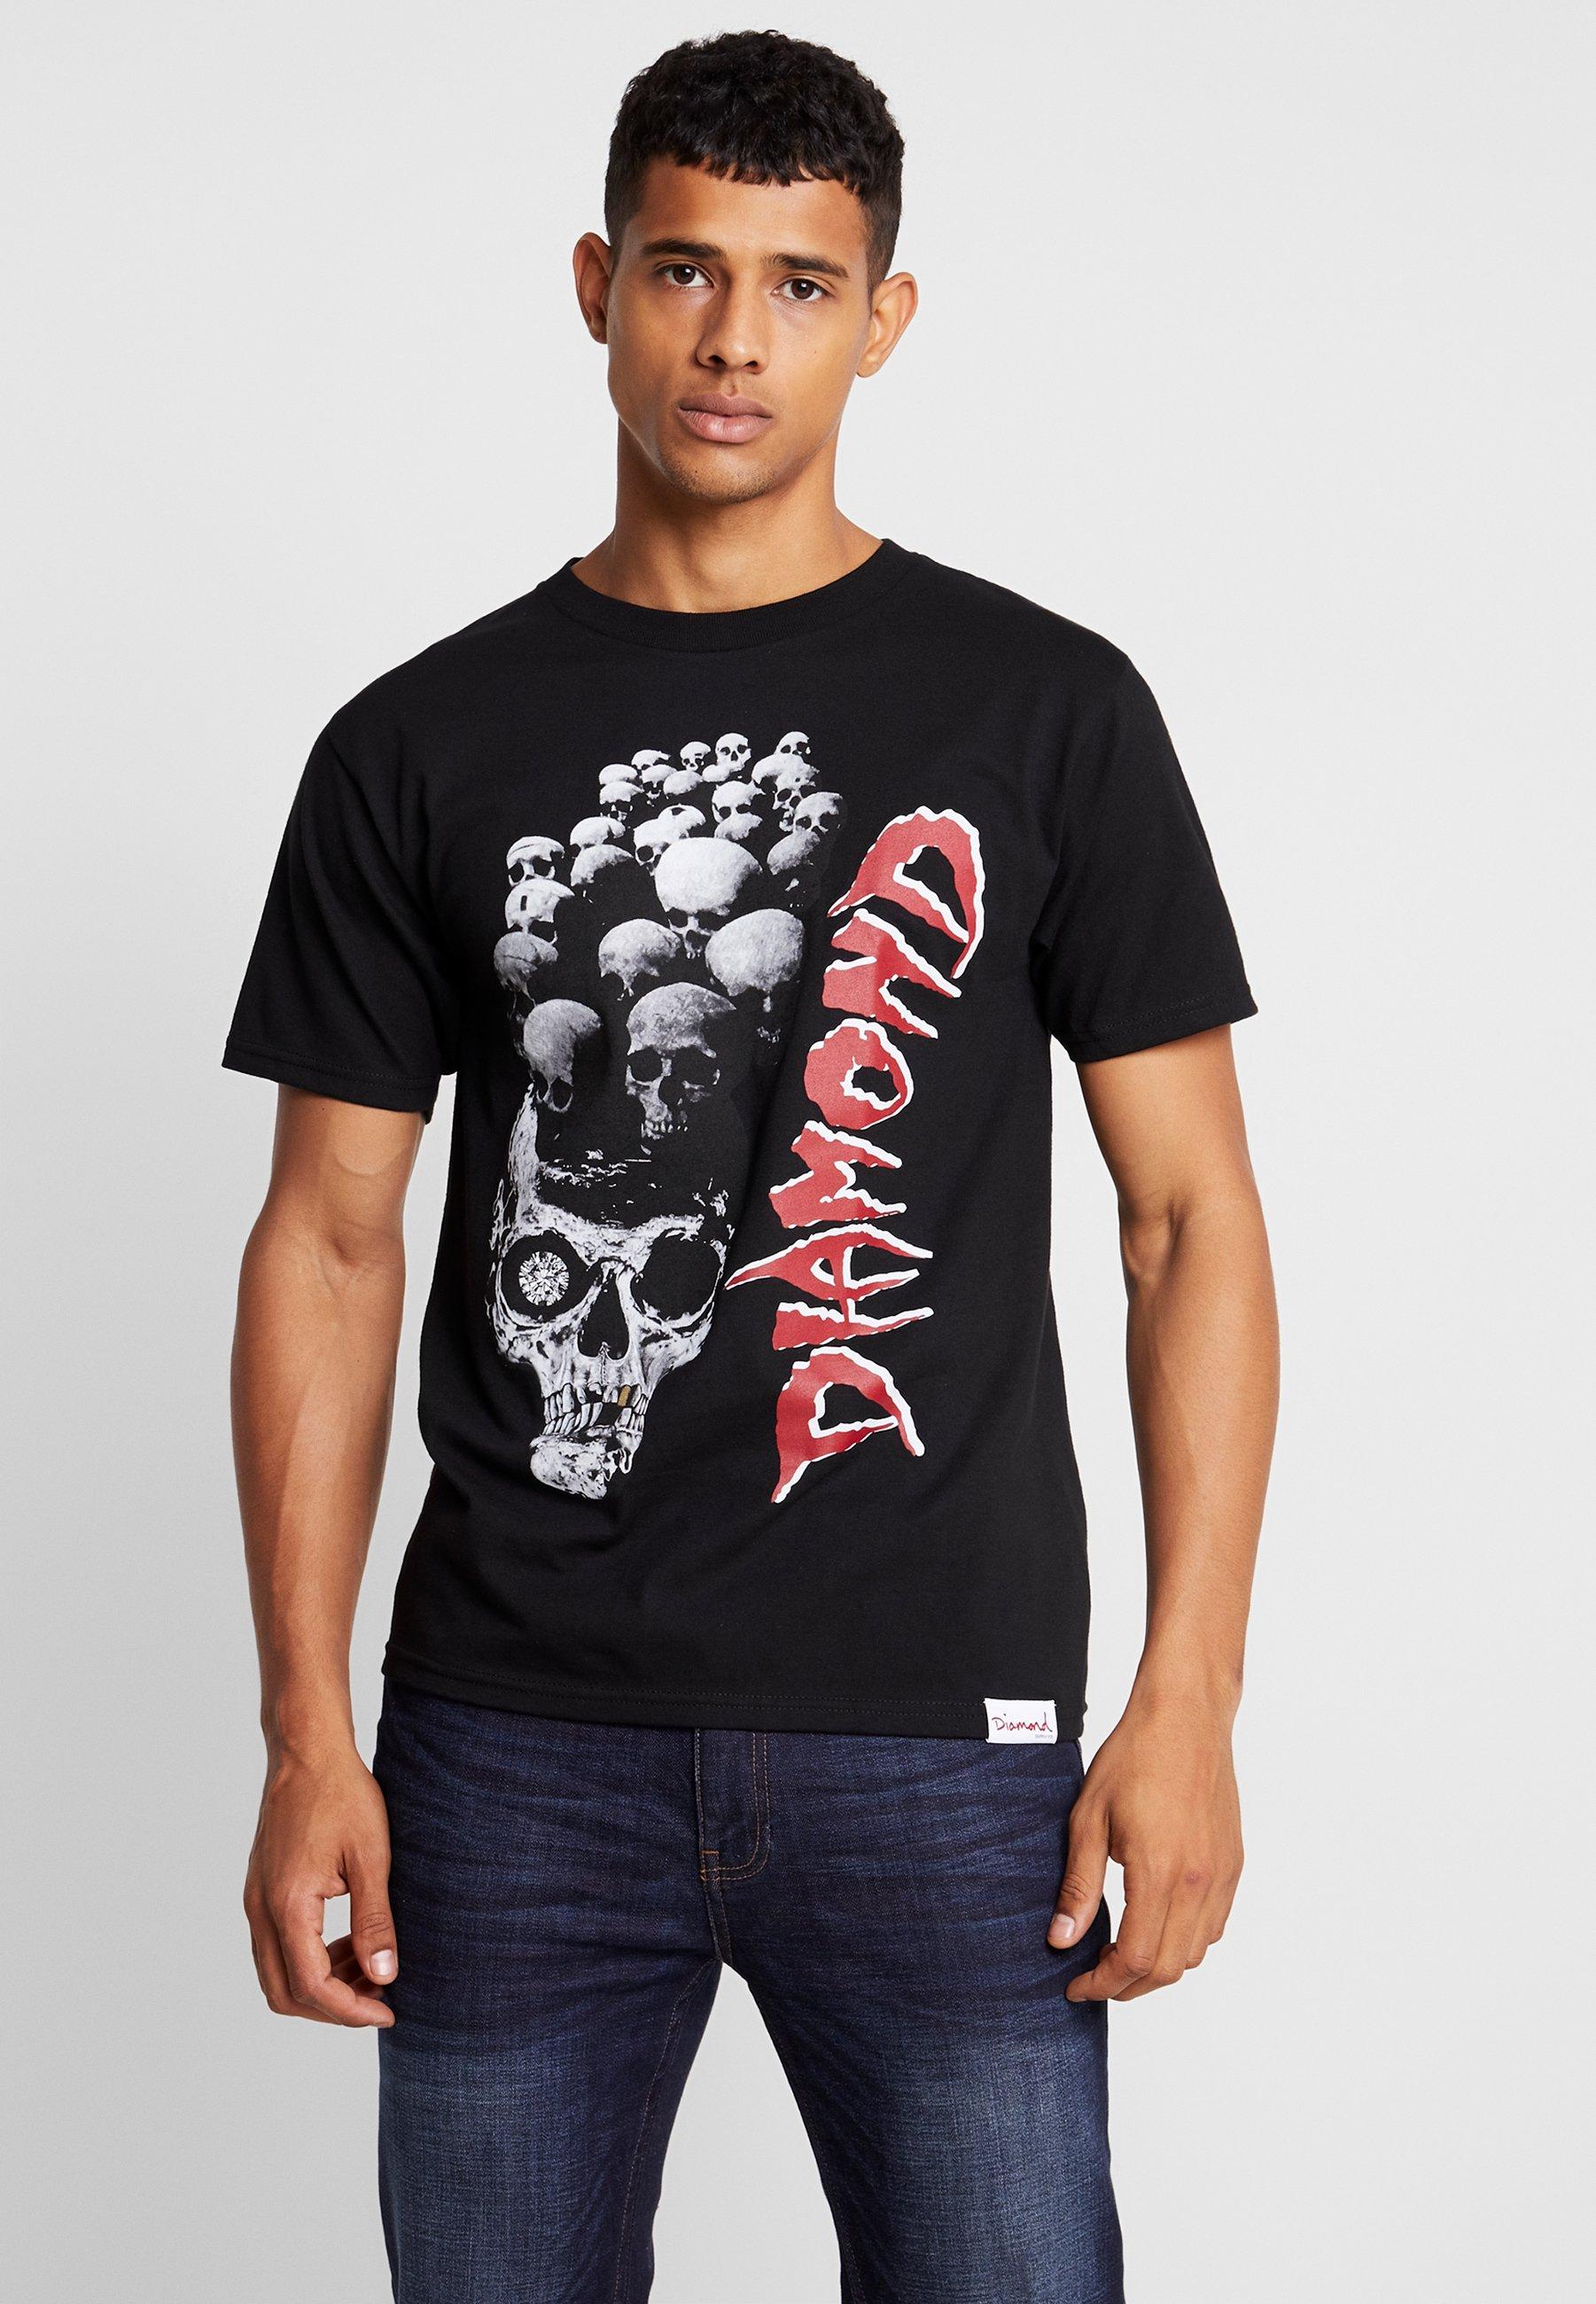 Supply Diamond Black shirt CoBurial GroundT Imprimé OXZiPuk